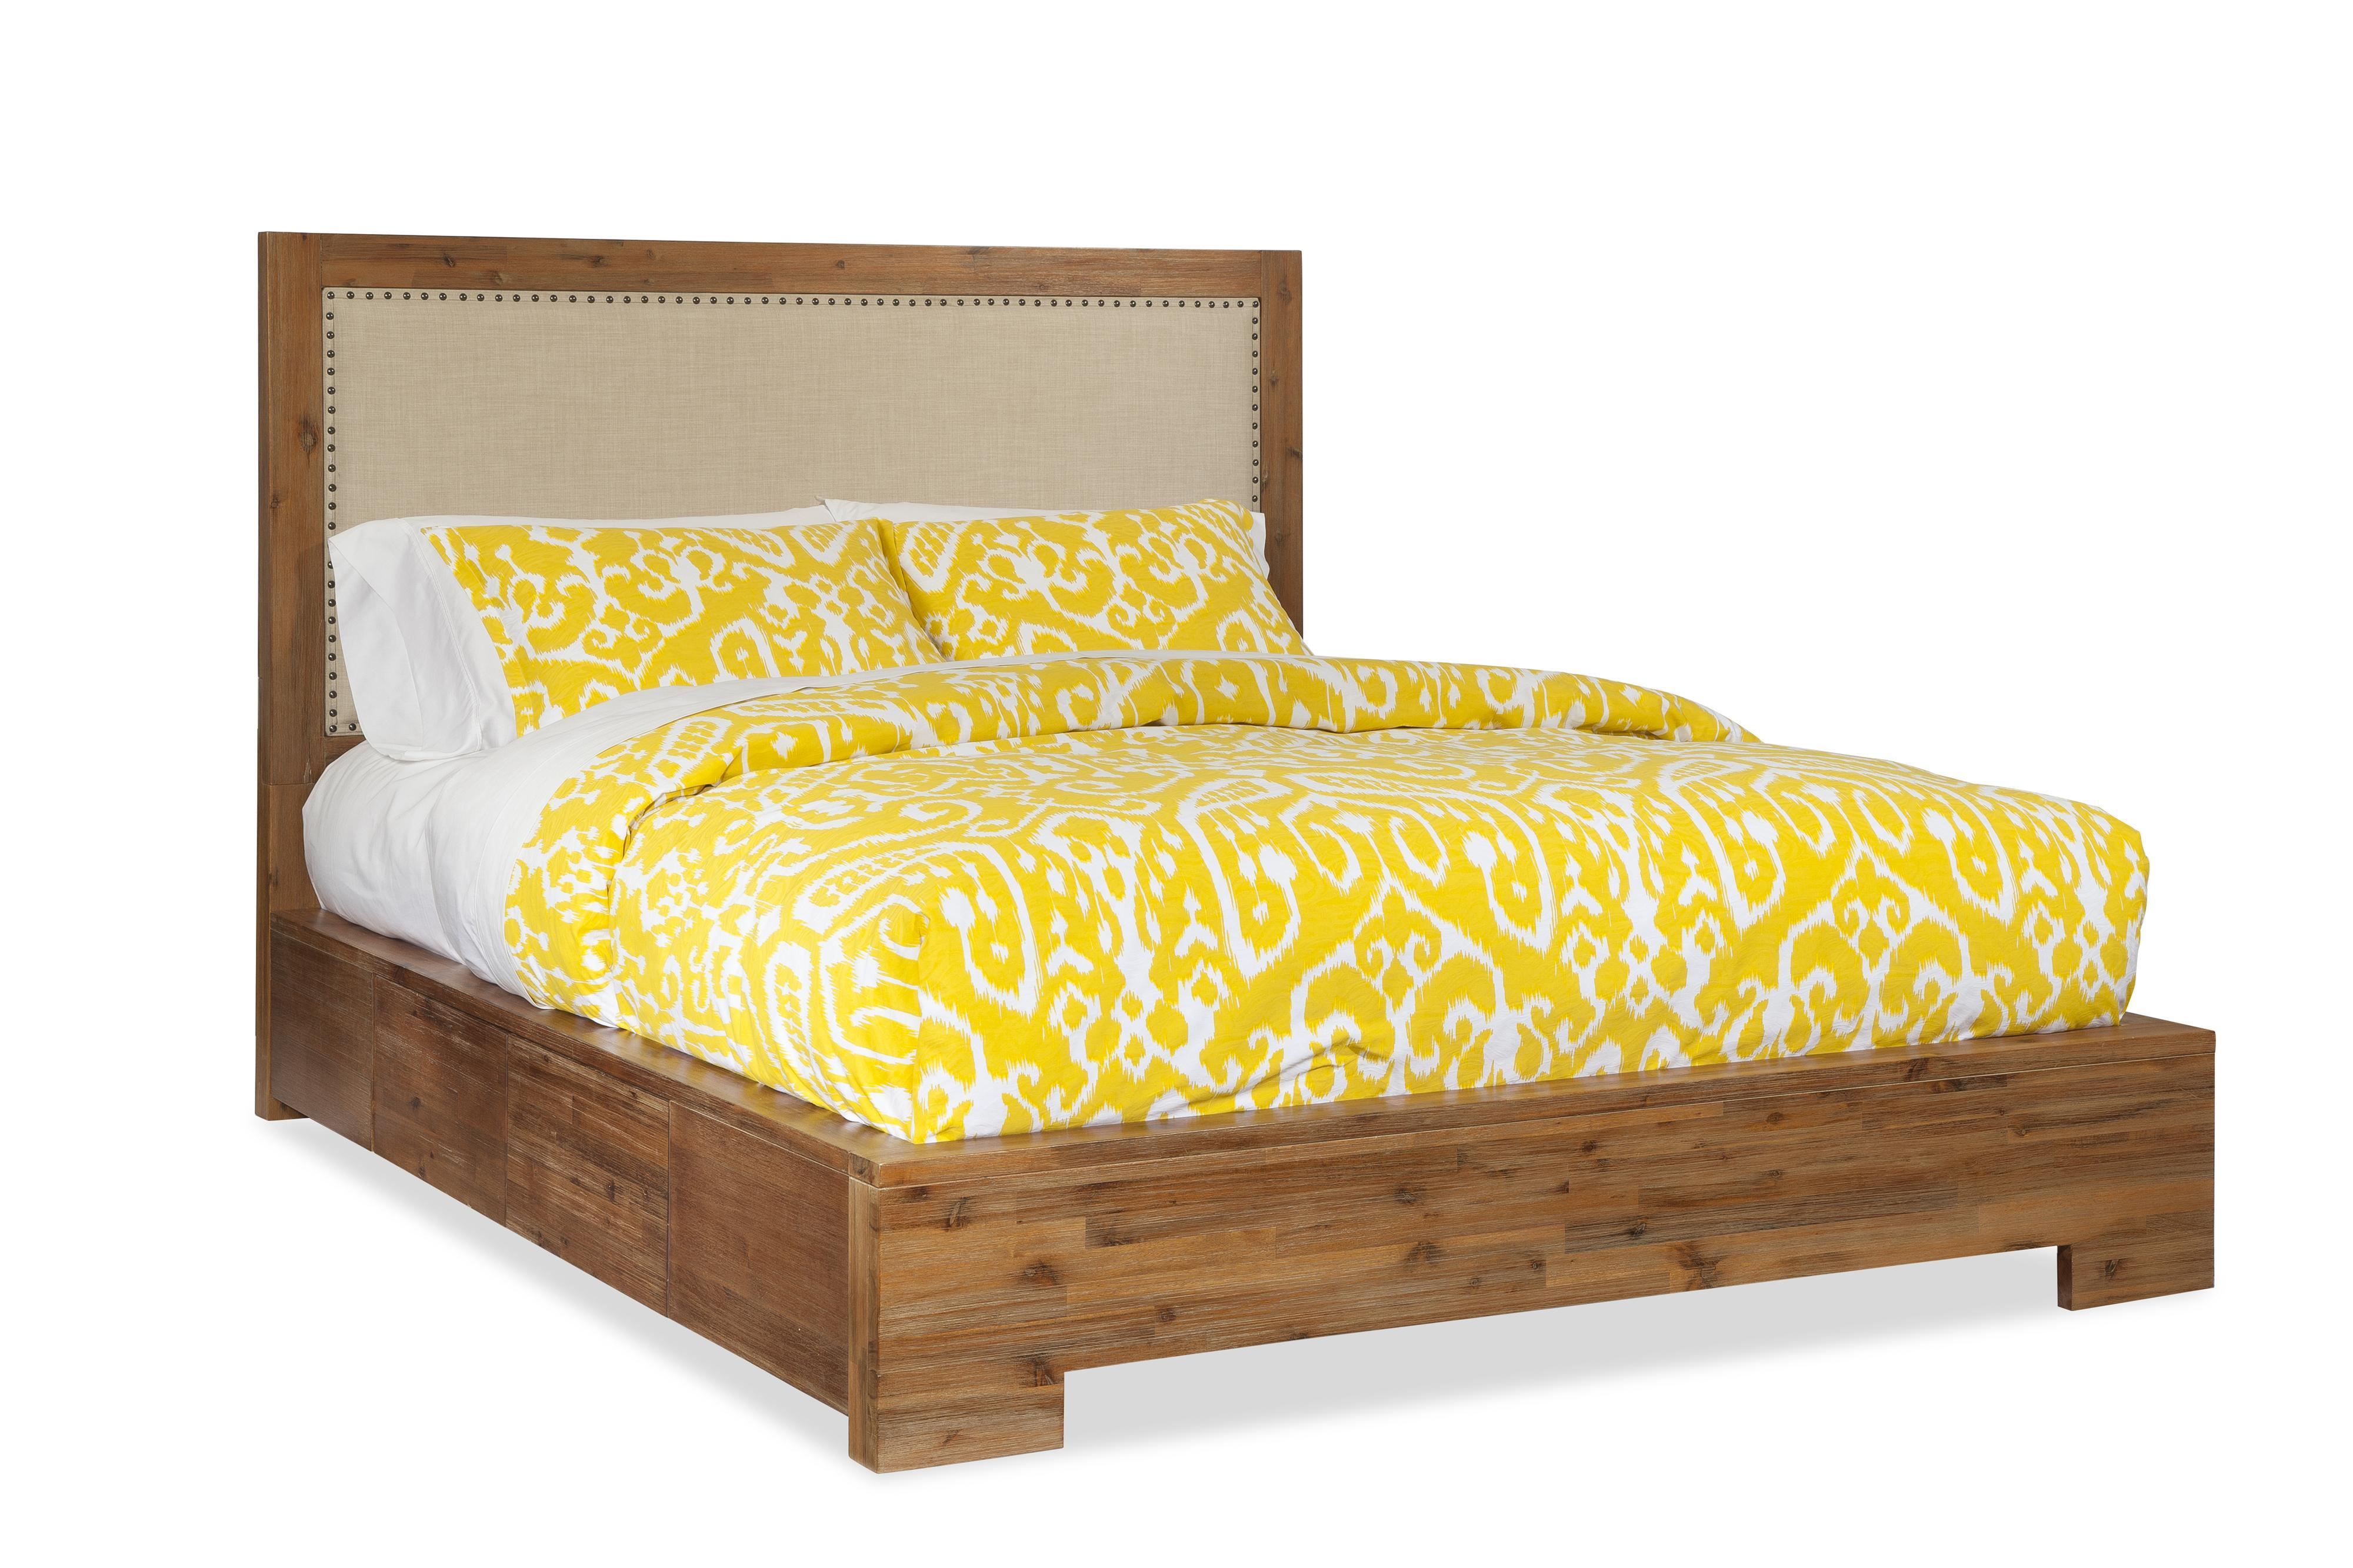 Cresent Fine Furniture Waverly Queen Upholstered Bed - Item Number: 5533QB+QR